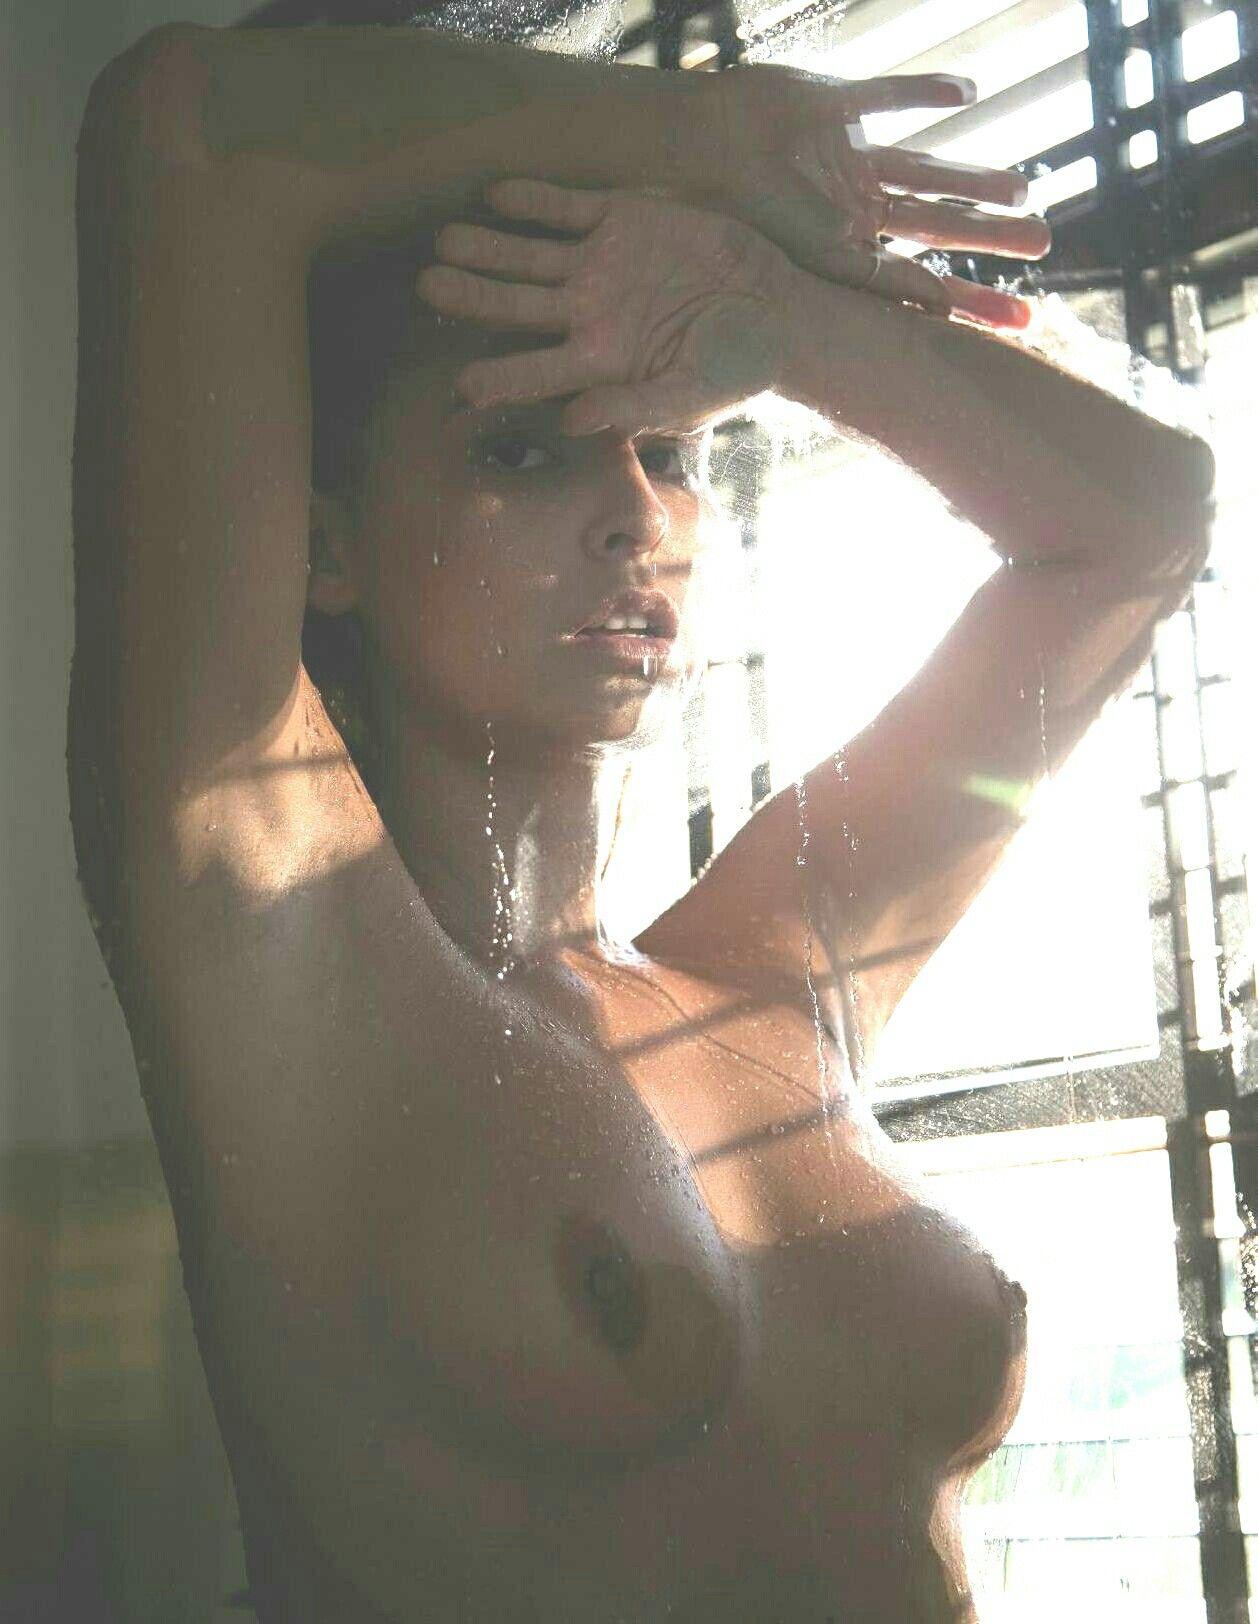 Photo Rosa Brighid nudes (26 photos), Tits, Paparazzi, Selfie, legs 2020